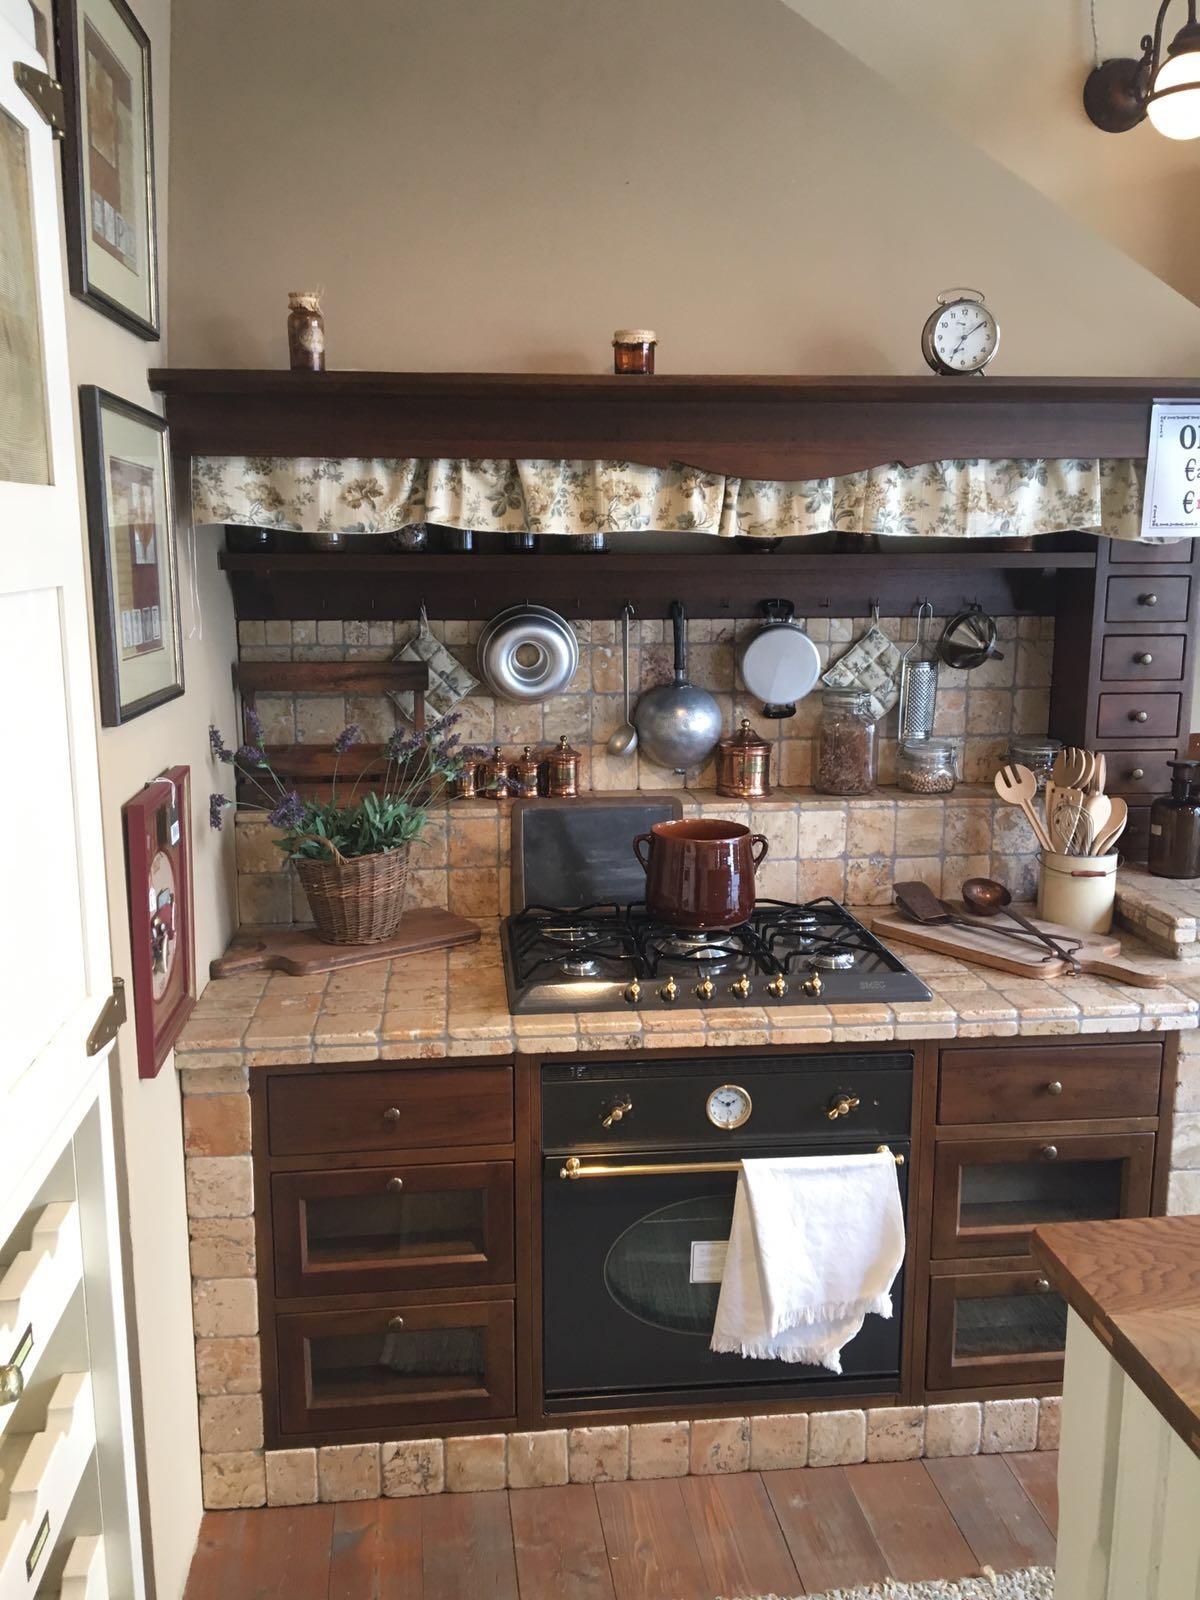 Cucina marchi mod doralice scontata del 60 cucine a - Marchi cucine outlet ...